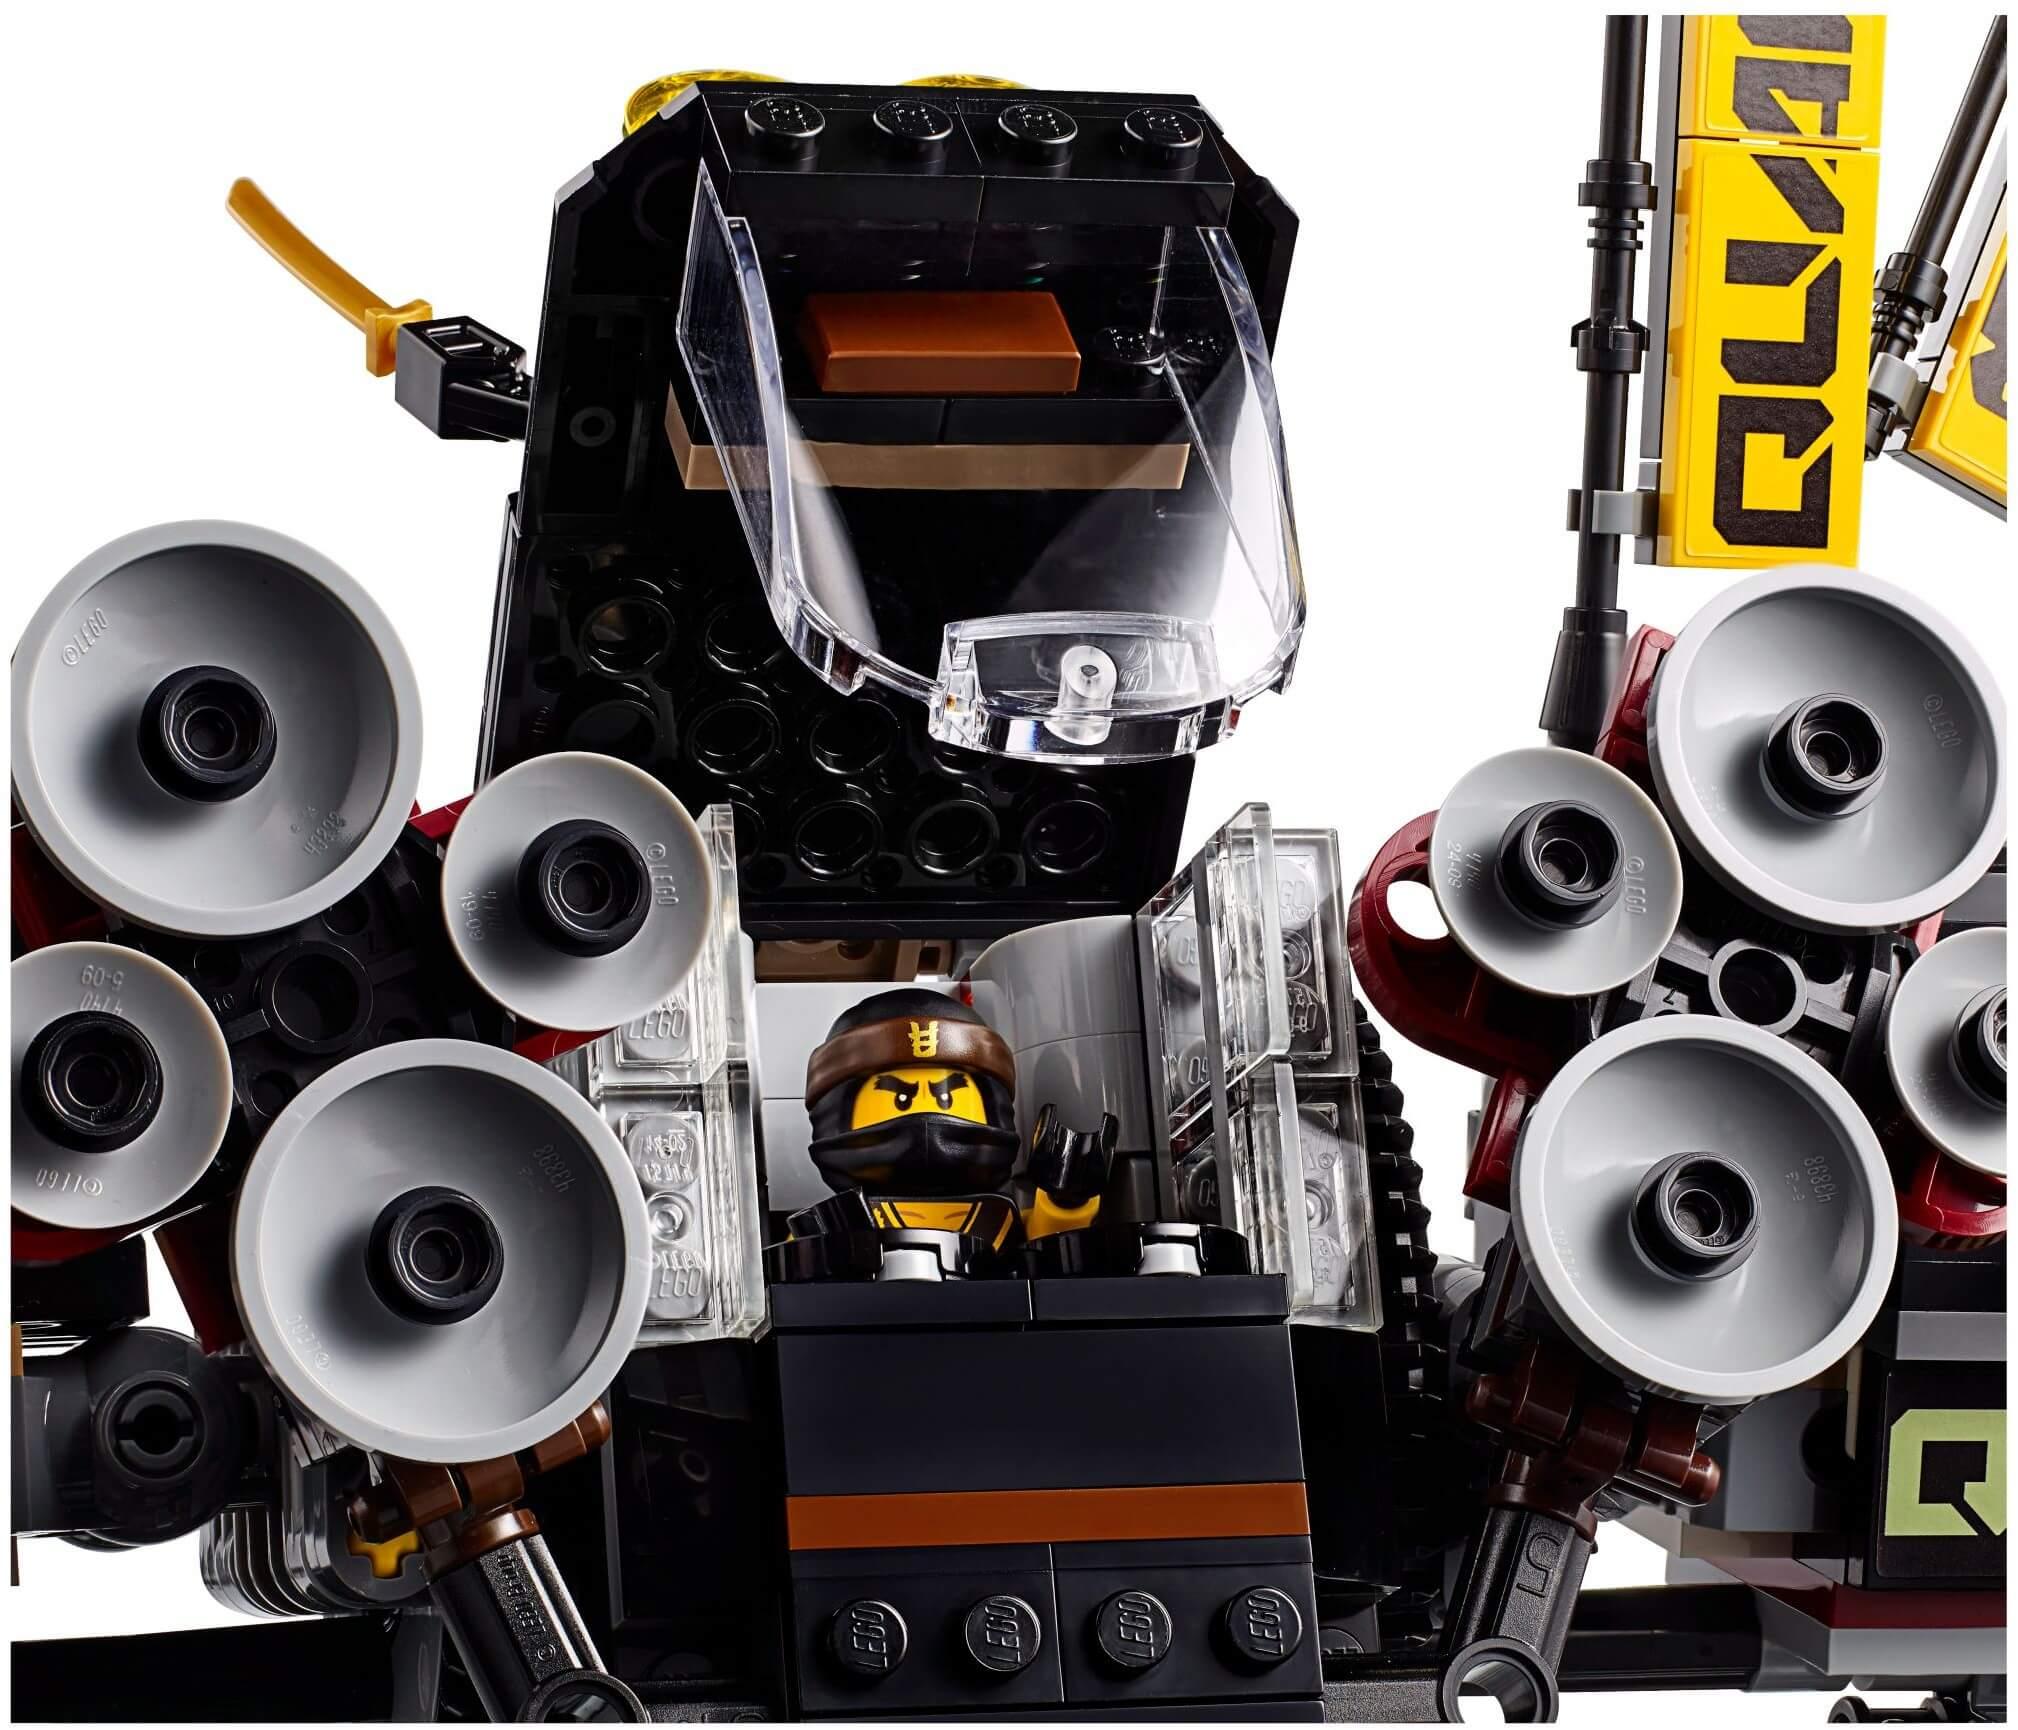 Mua đồ chơi LEGO 70632 - LEGO Ninjago 70632 - Người Máy Siêu Âm của Cole (LEGO Ninjago 70632 Quake Mech)